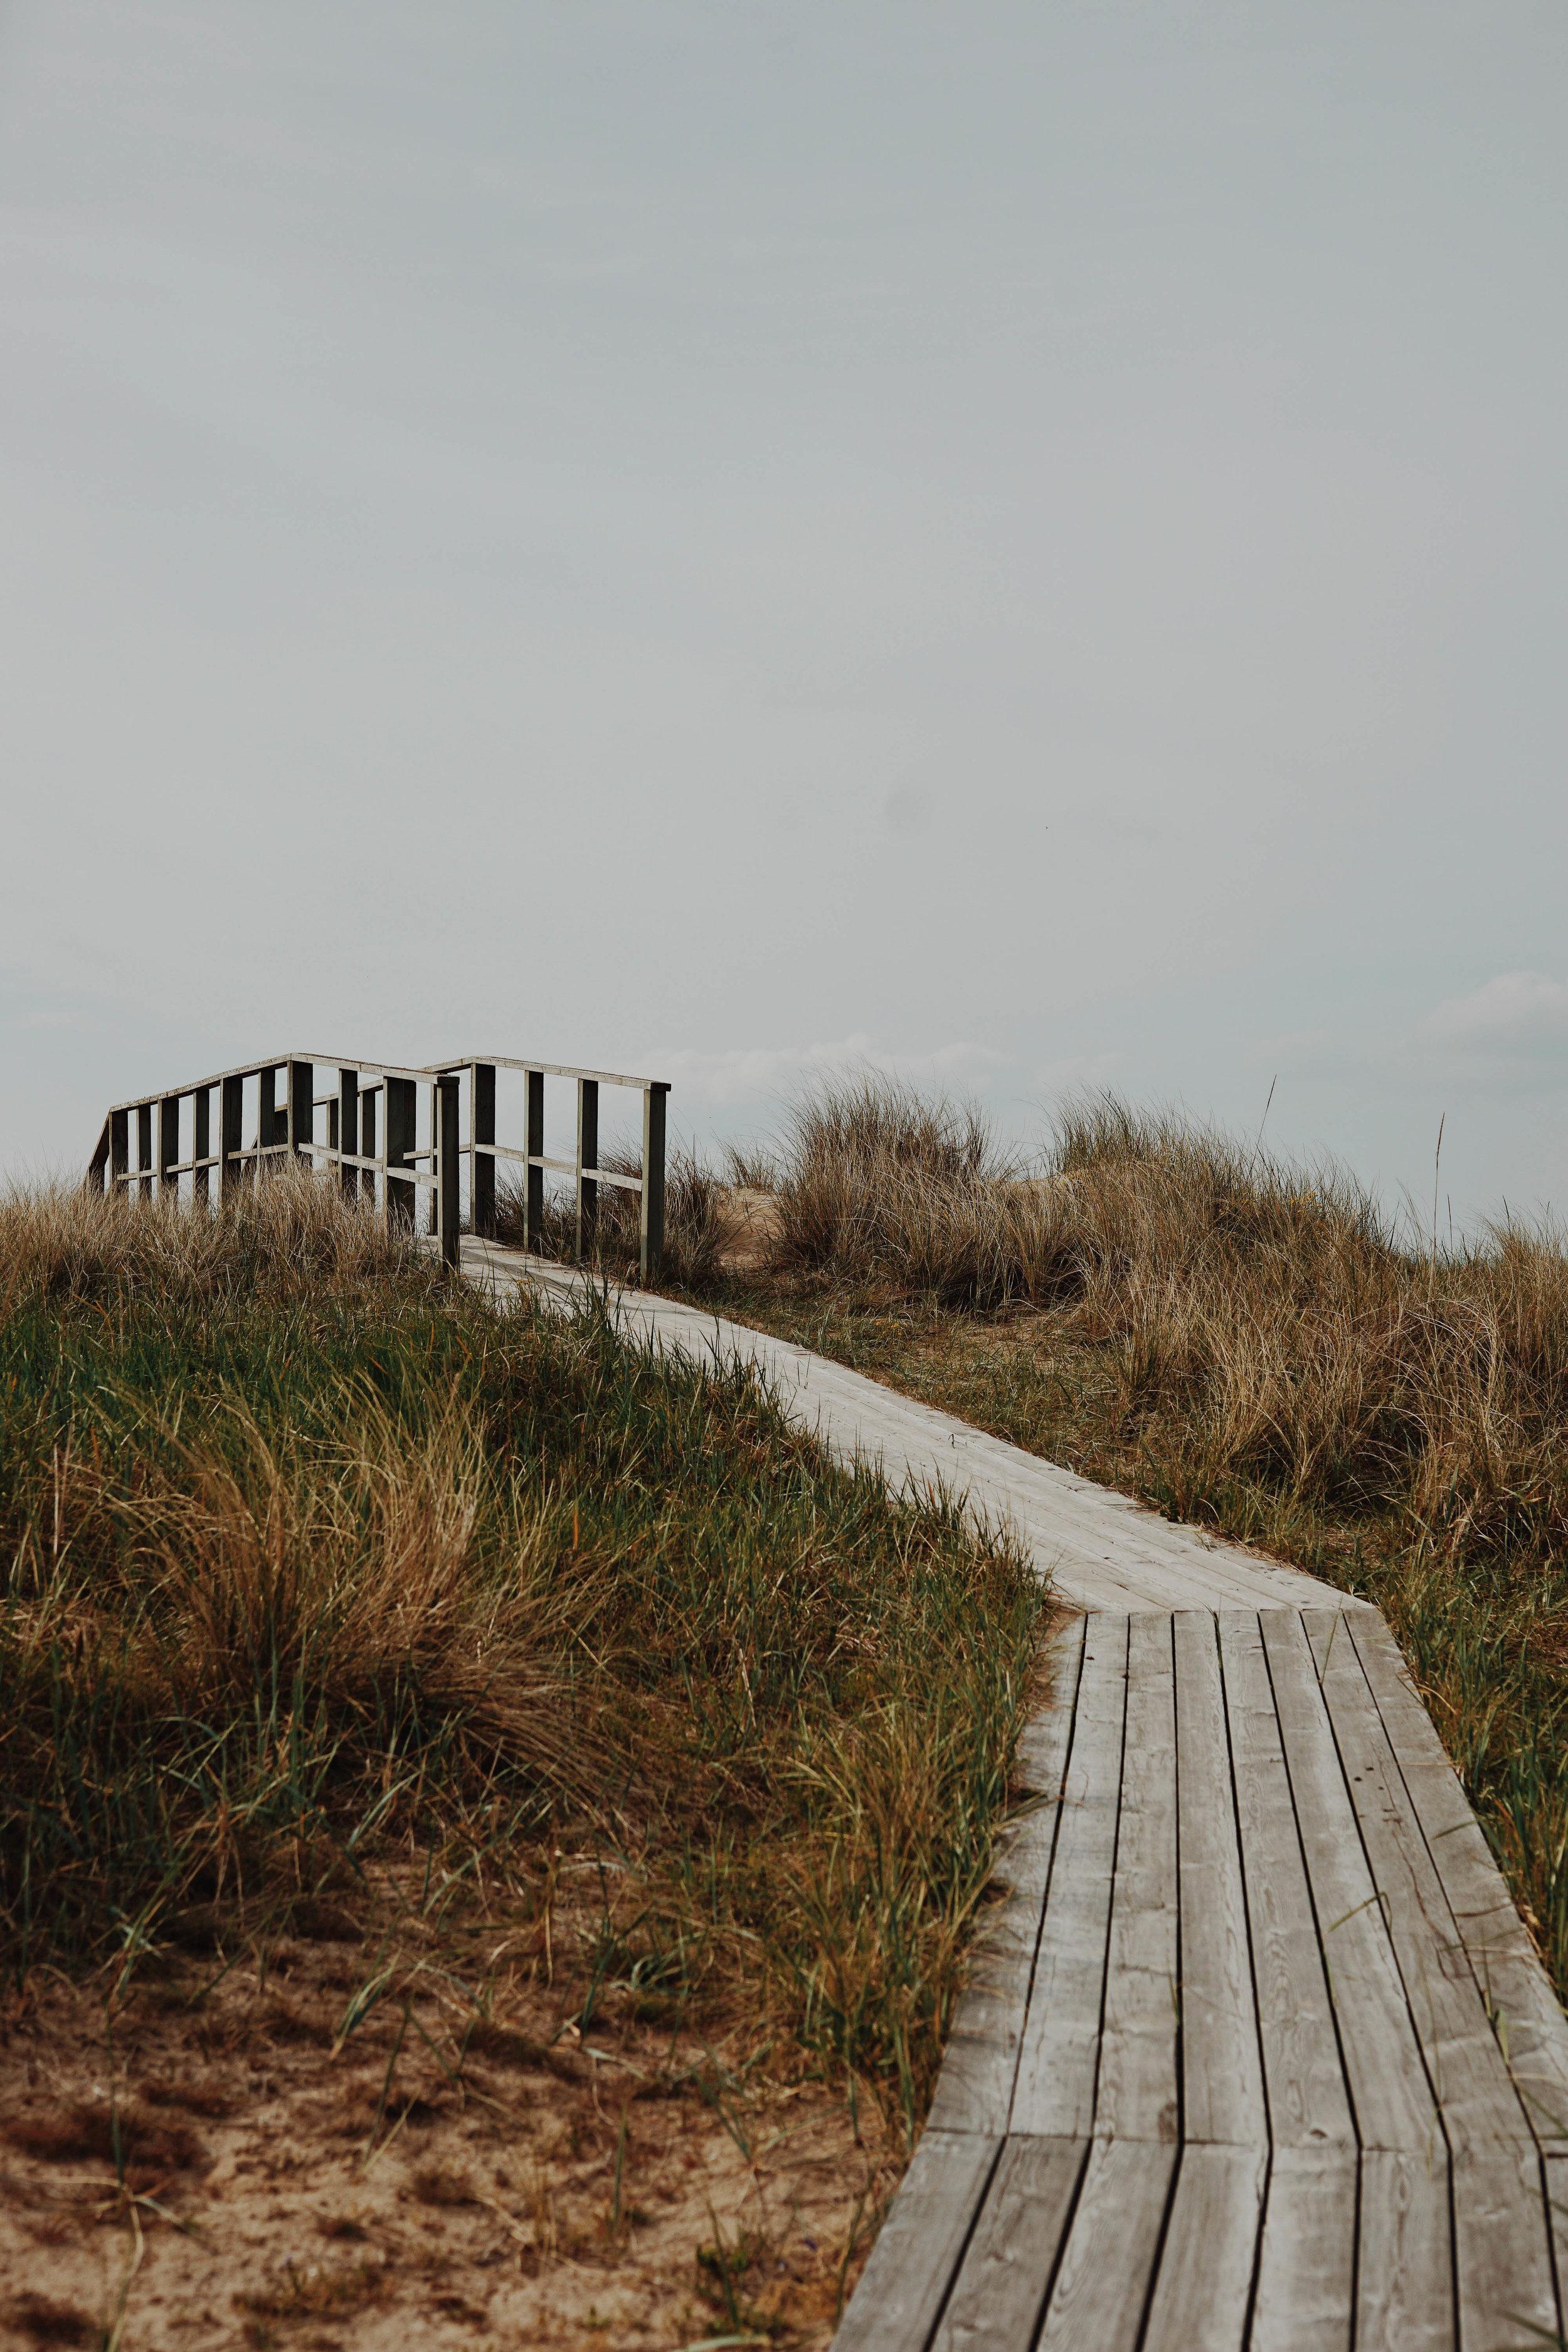 ASROSENVINGE_VisitSkane_Sweden_Vejbystrand_Countryside_Pathway_Boardwalk_LowRes-177.jpg